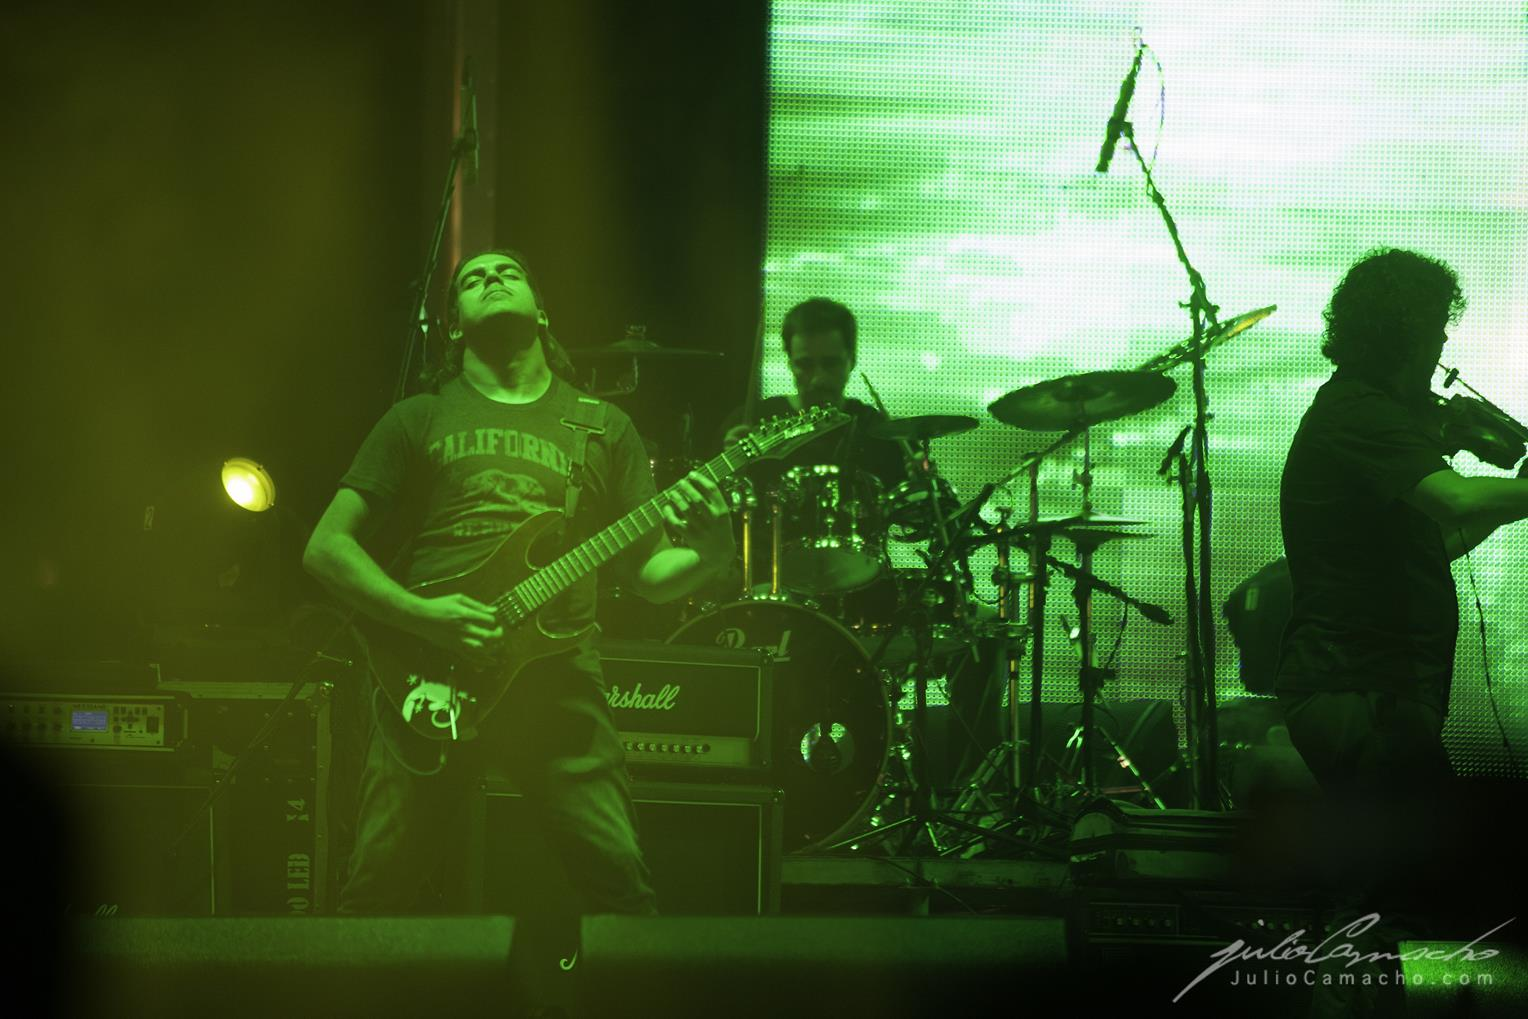 2014-10-30 31 CAST TOUR Ensenada y Tijuana - 1415 - www.Juli (Copy).jpg